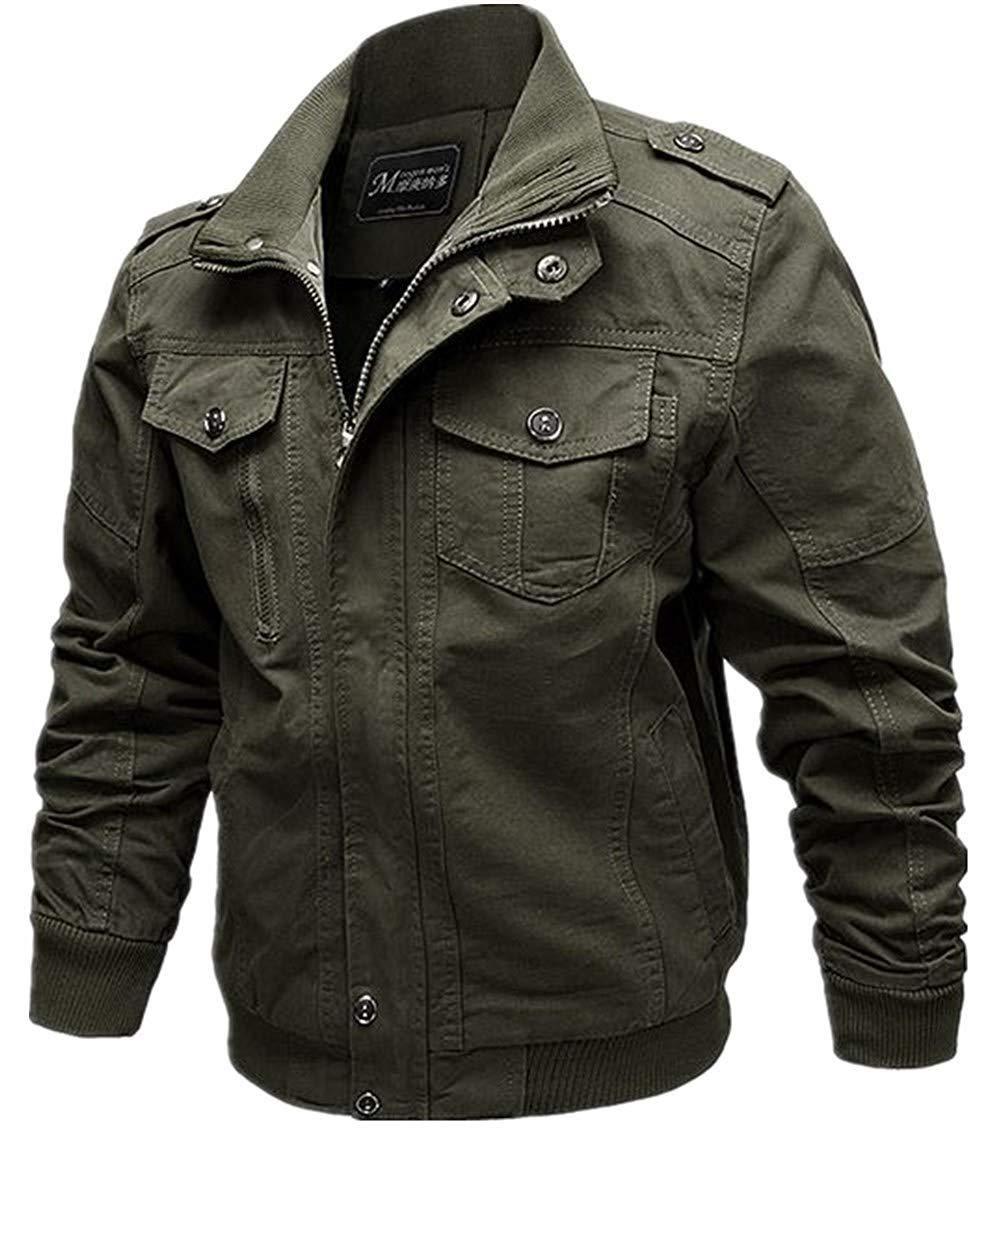 b1aa052da7 Sansberia Men's Casual Winter Cotton Military Jackets Outdoor Coat  Windproof Windbreaker